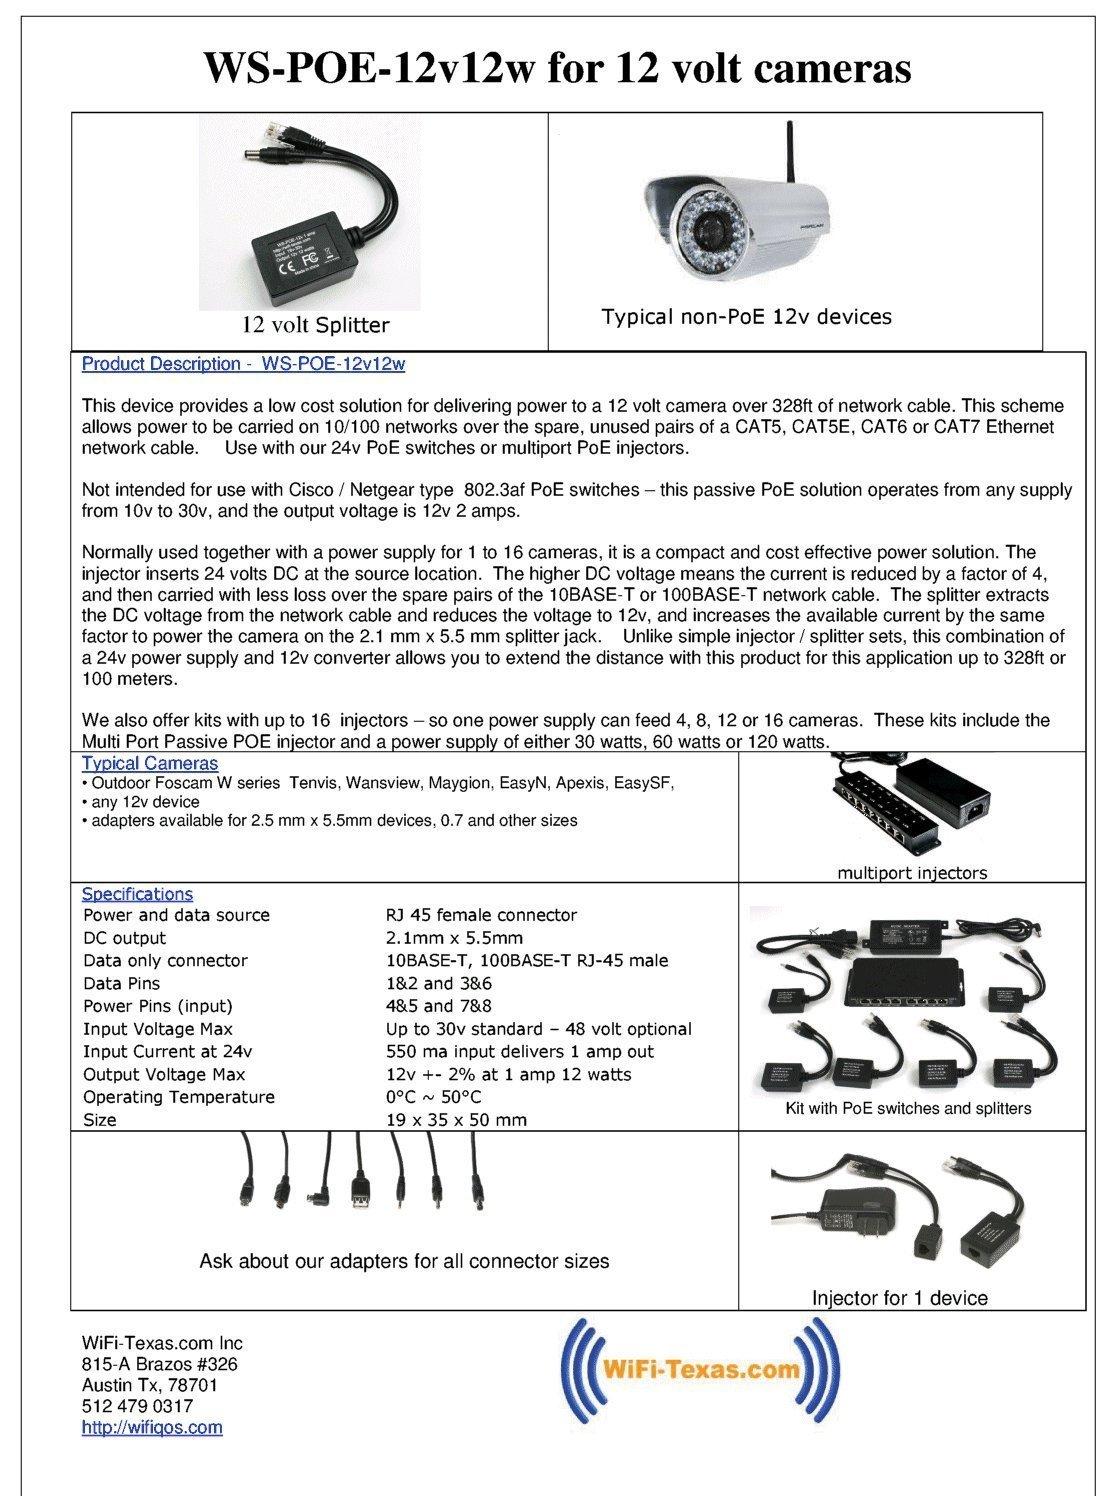 Fantastic Poe Wiring Rj45 Ideas - The Wire - magnox.info